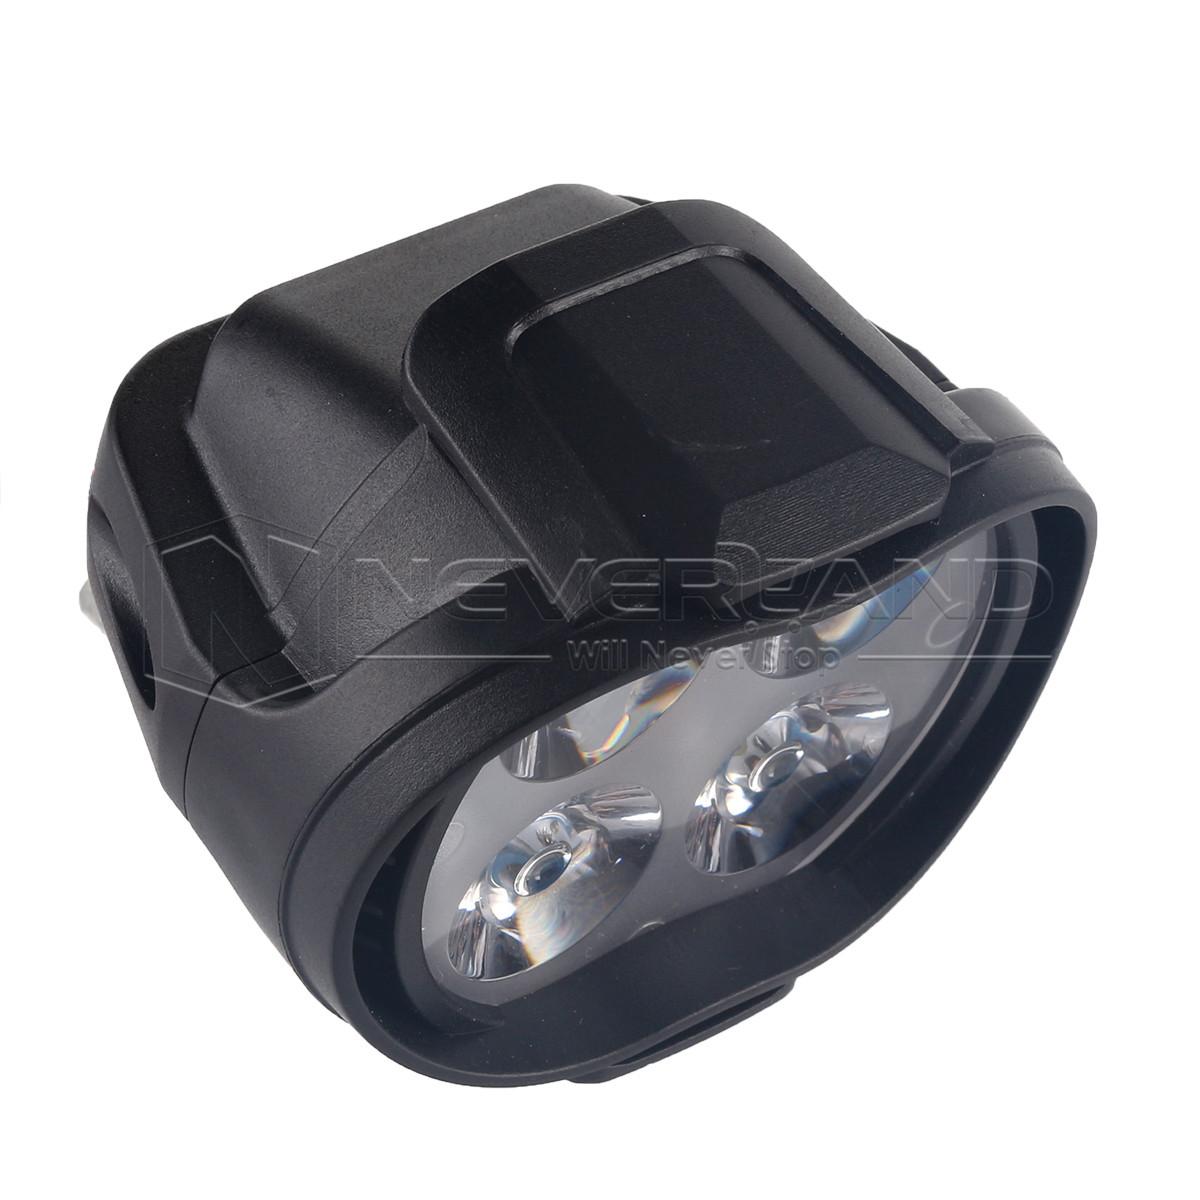 2x 12w 12v 4 led scheinwerfer birnen leuchte lampen f r auto motorrad fahrad ebay. Black Bedroom Furniture Sets. Home Design Ideas